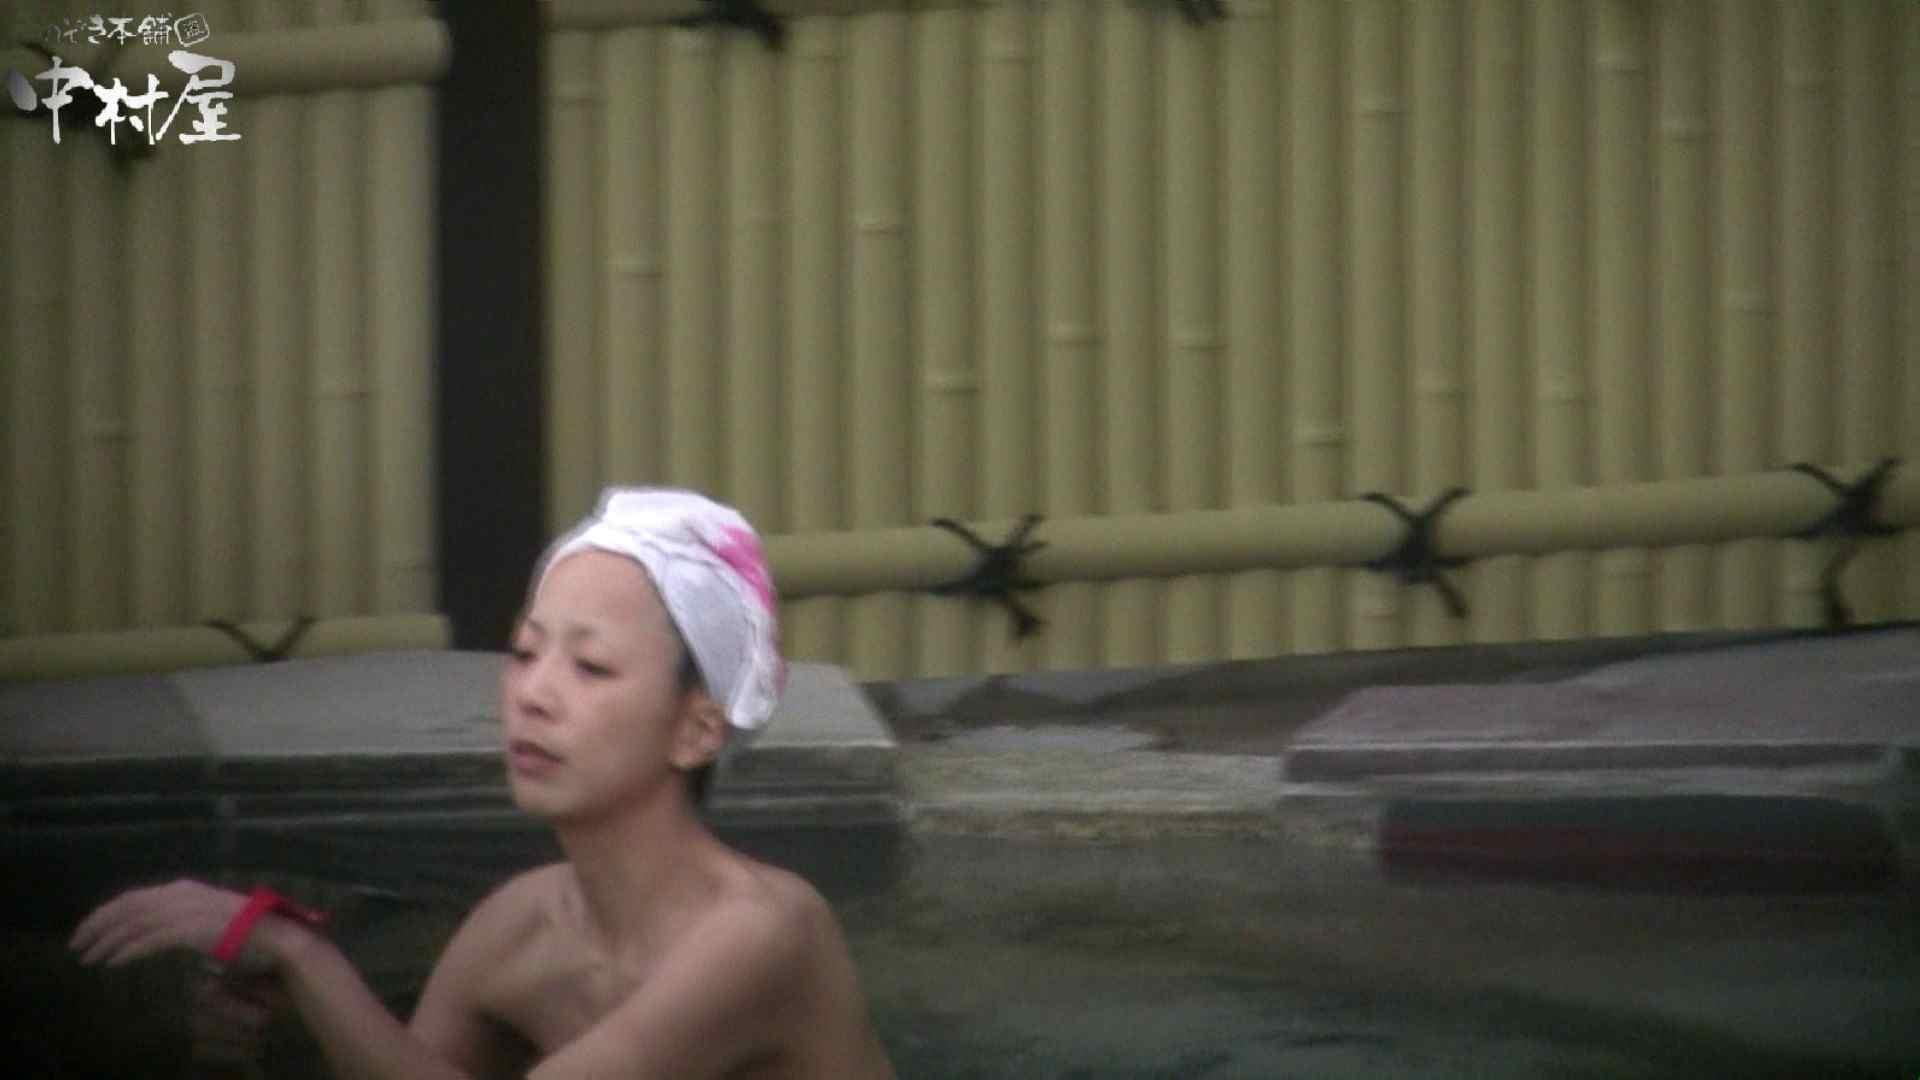 Aquaな露天風呂Vol.929 盗撮  104連発 27